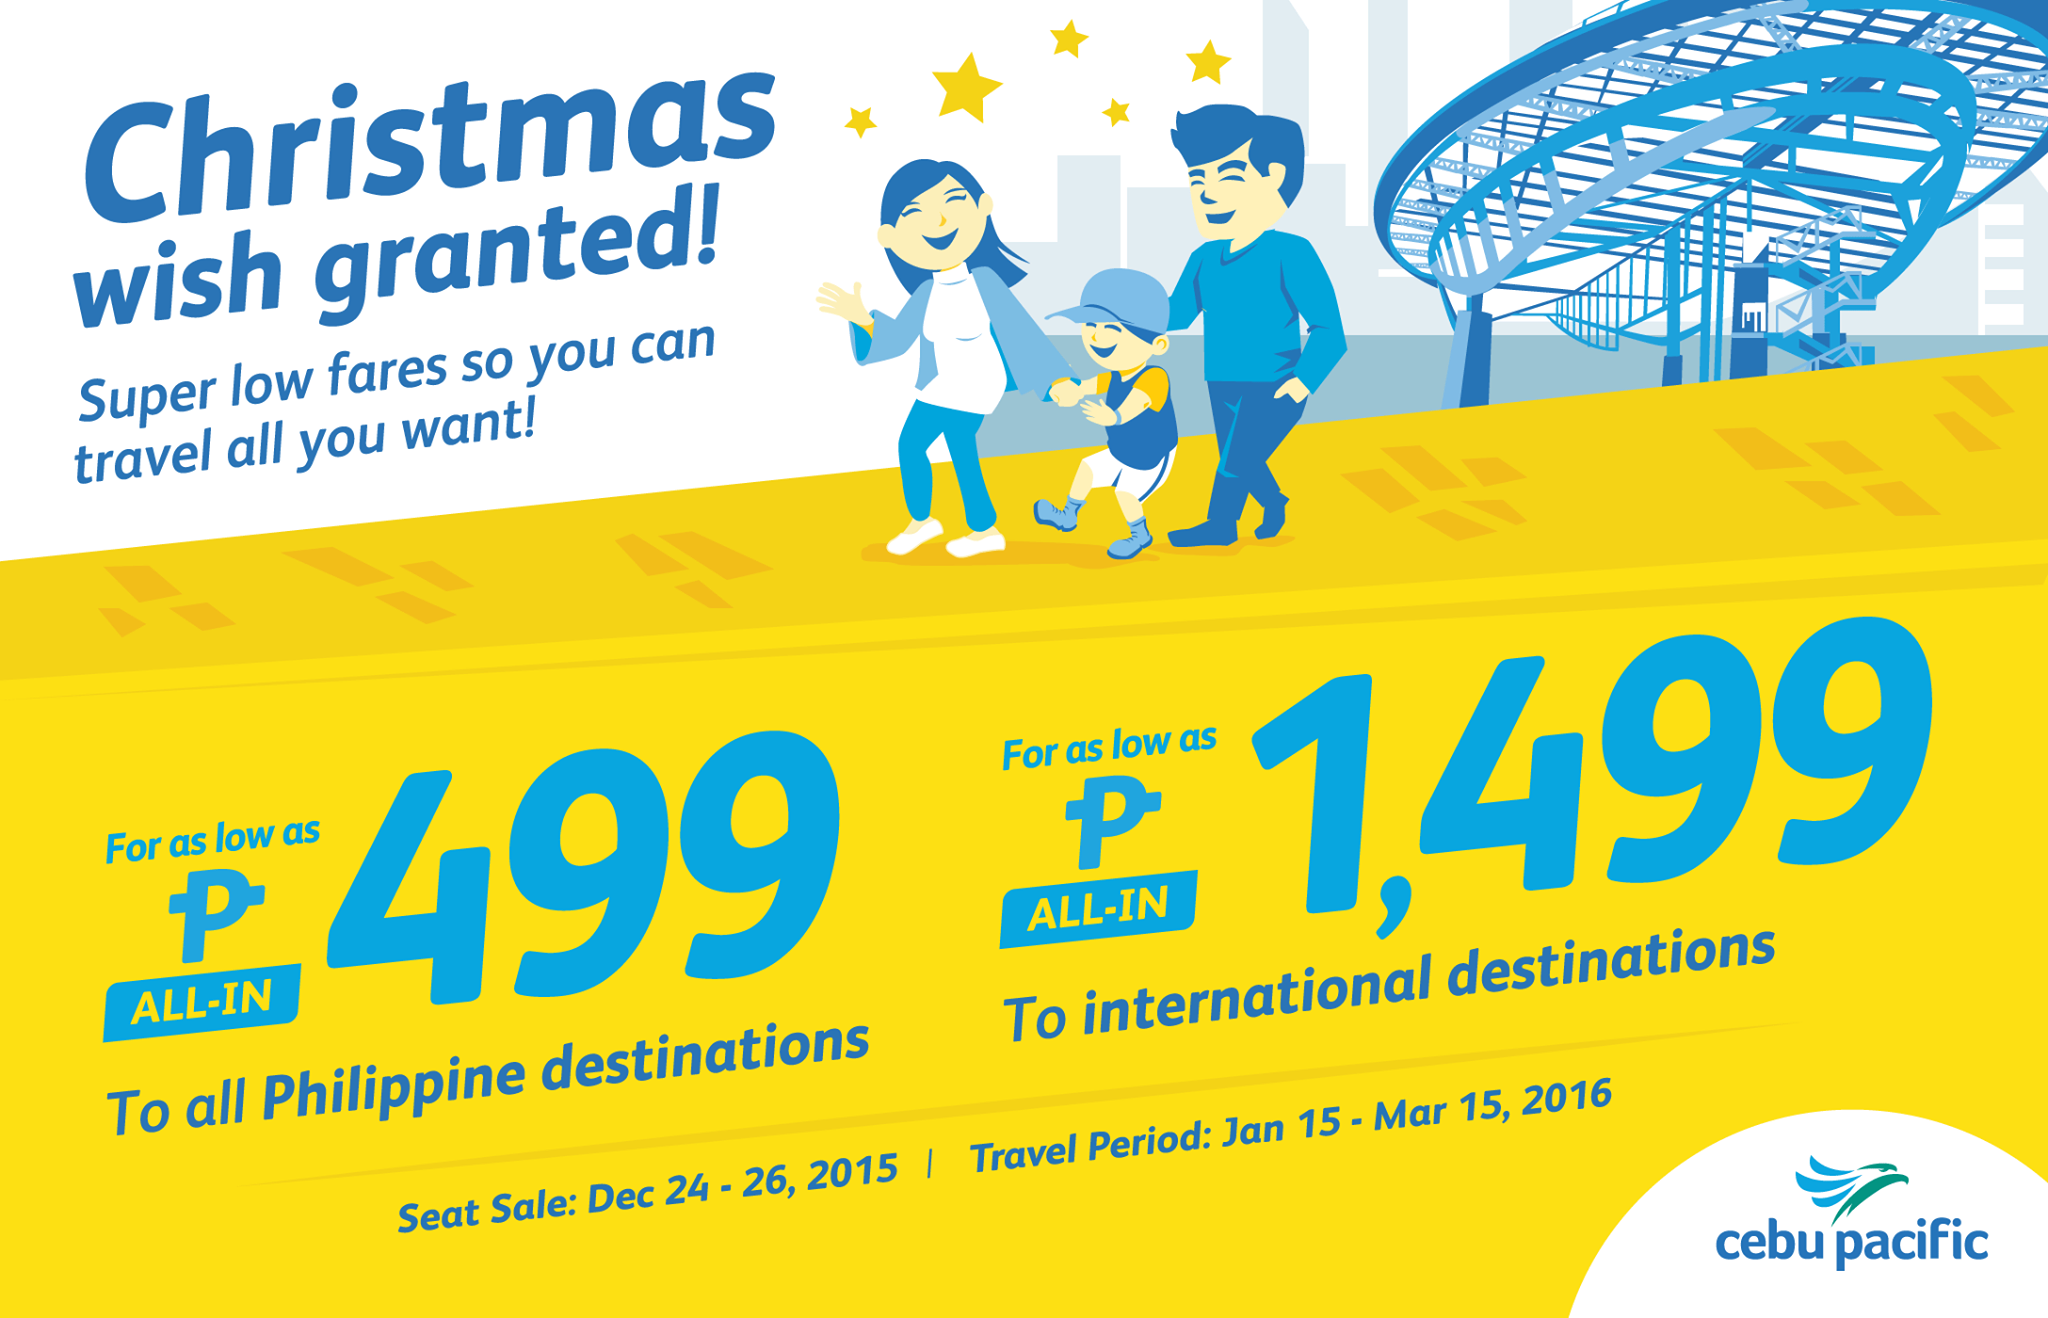 Cebu Pacific Promo December 24 2015